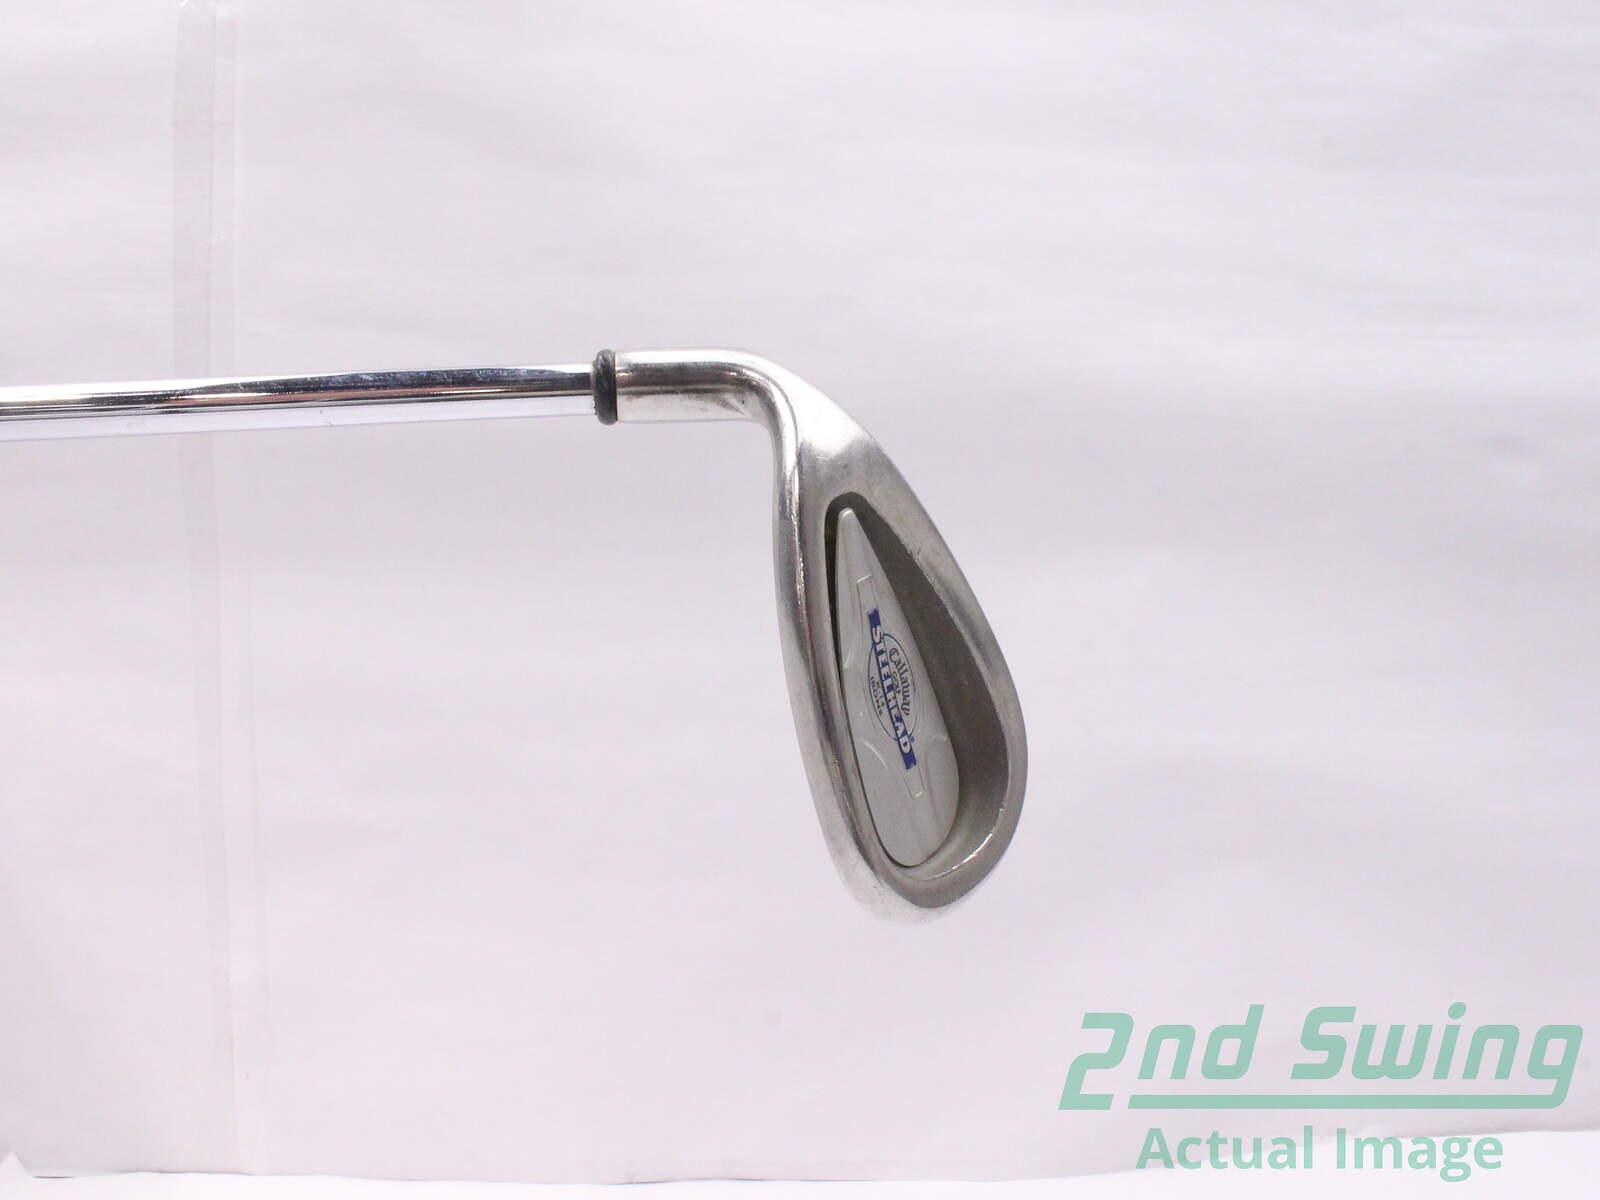 Used Callaway X 14 Wedge Sand Sw Stock Steel Shaft Steel Wedge Flex